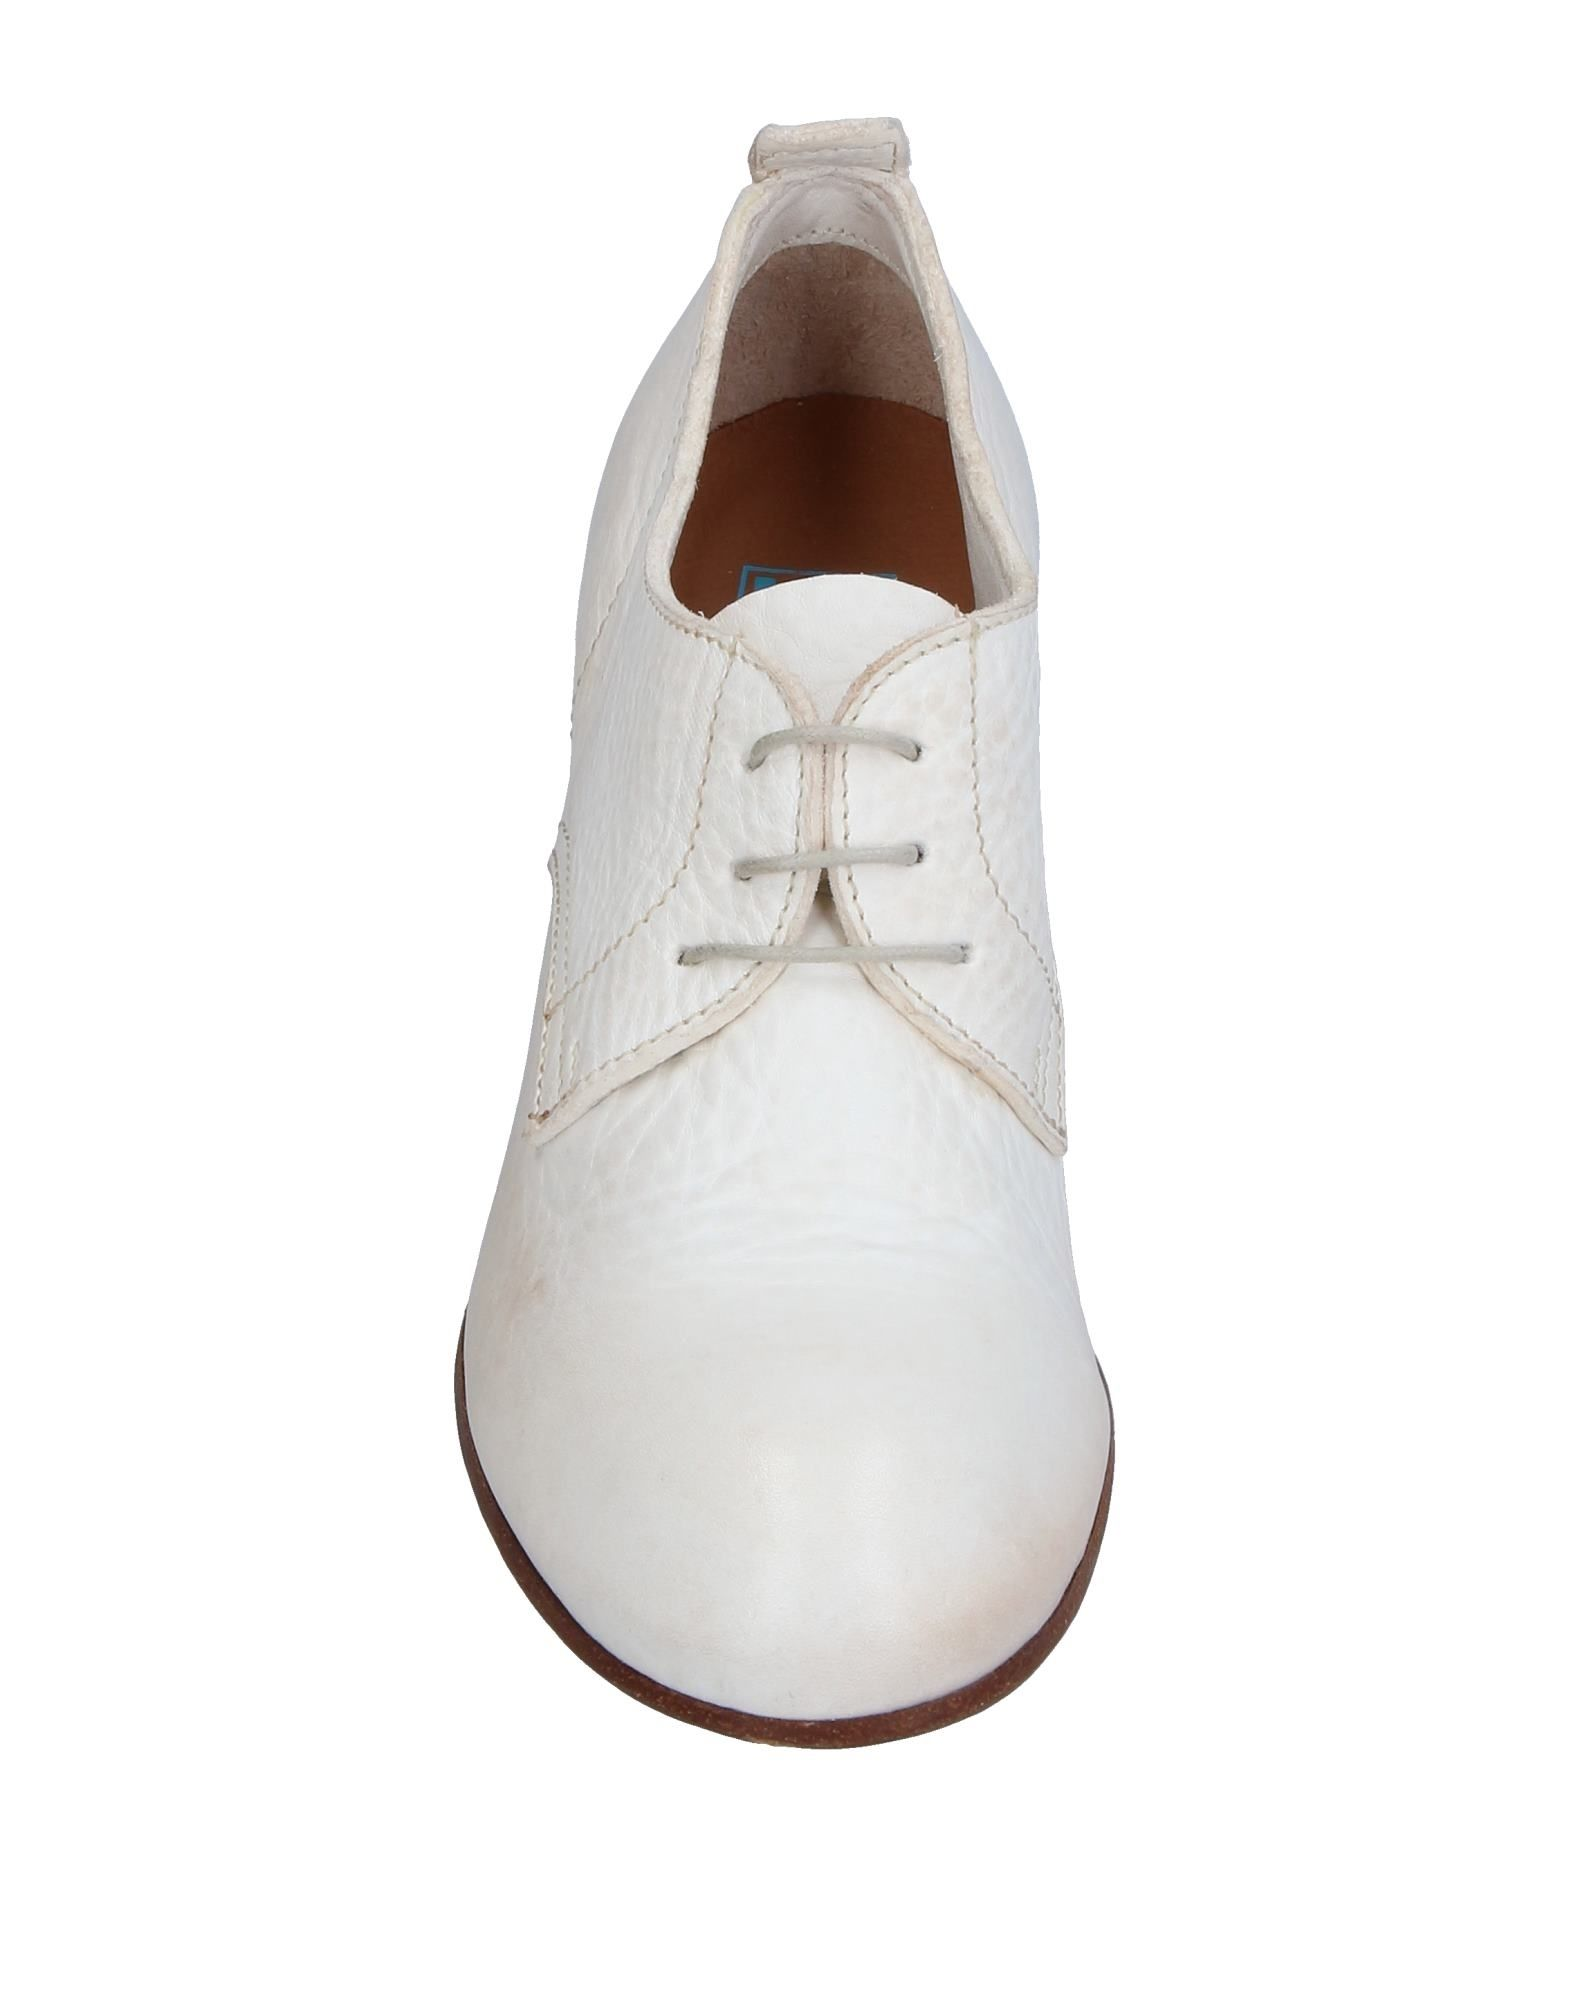 Stilvolle Stilvolle Stilvolle billige Schuhe Moma Schnürschuhe Damen  11326302IK ed4e2d